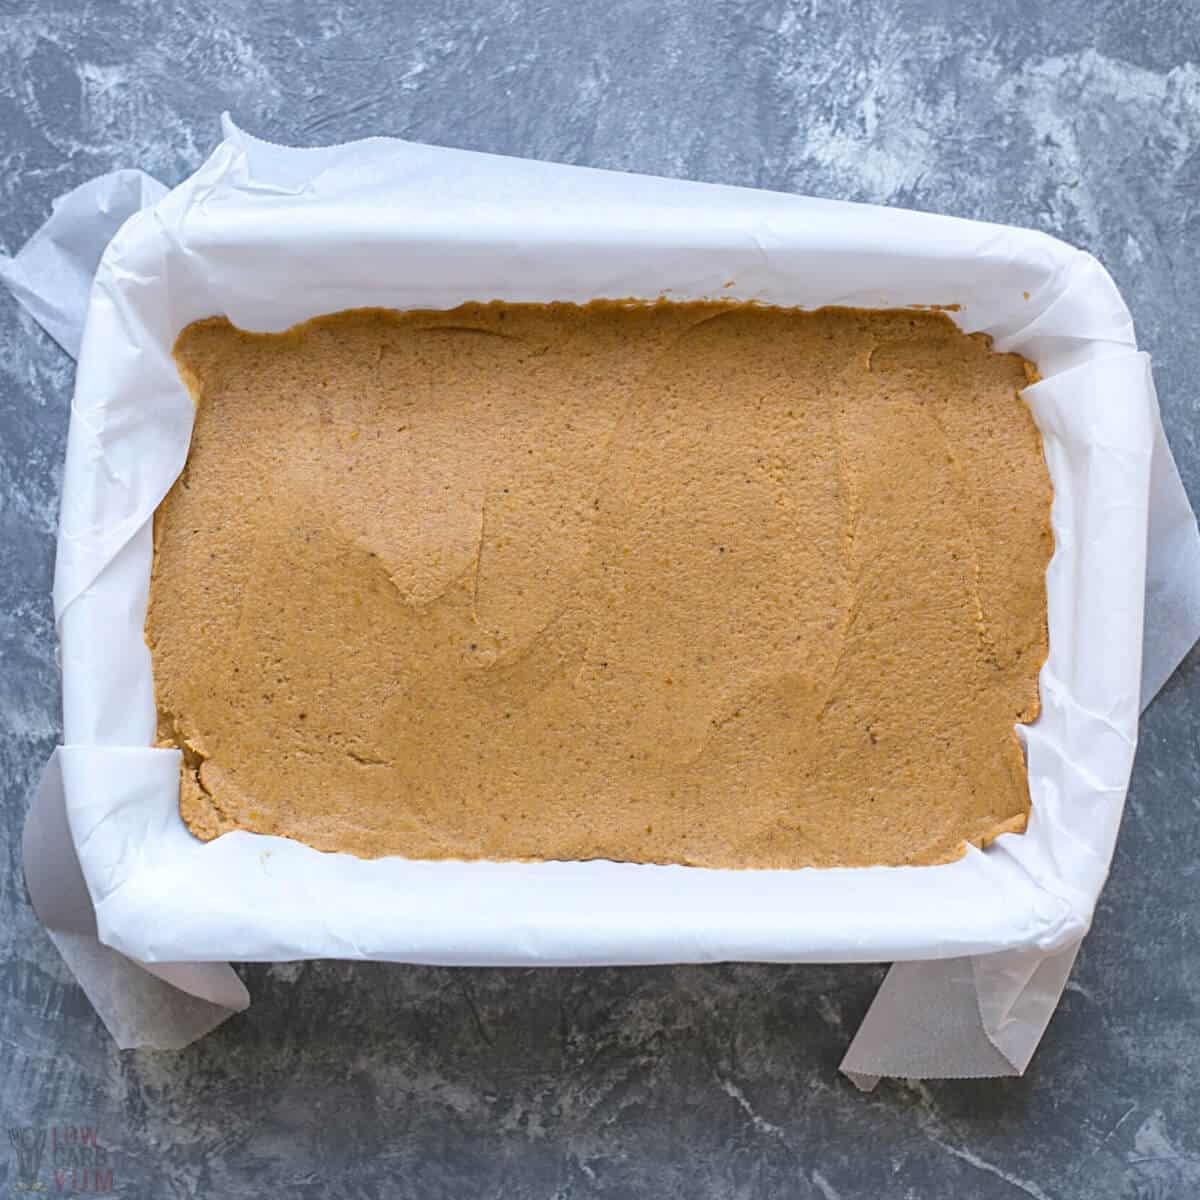 pumpkin fudge mixture spread into lined baking pan